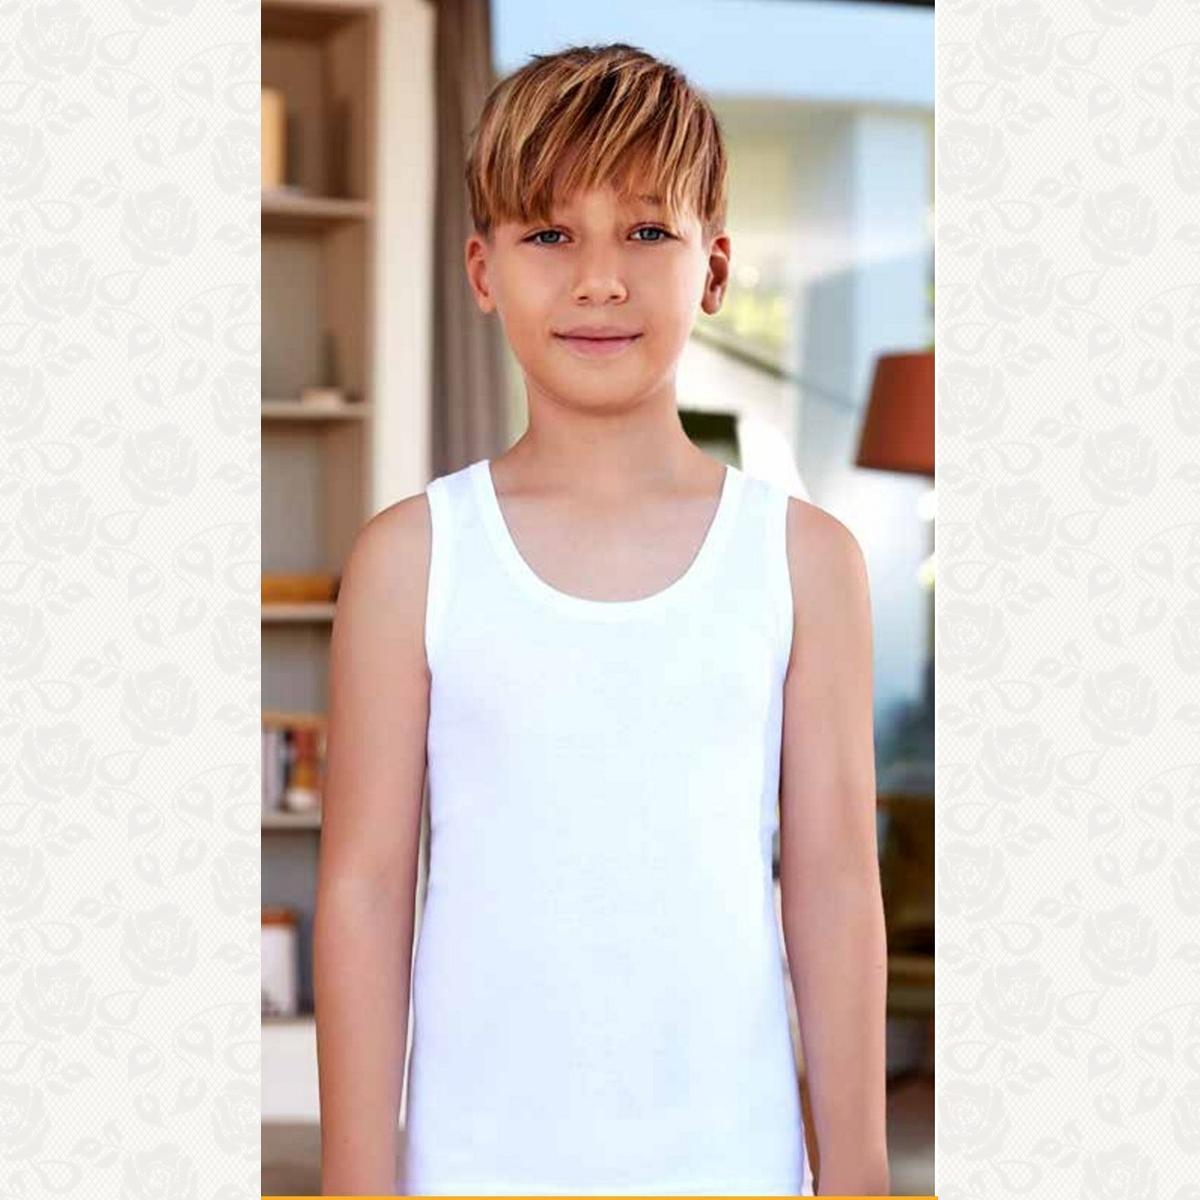 Майка для мальчика размер от 7 до 8, цвет , 6 шт.